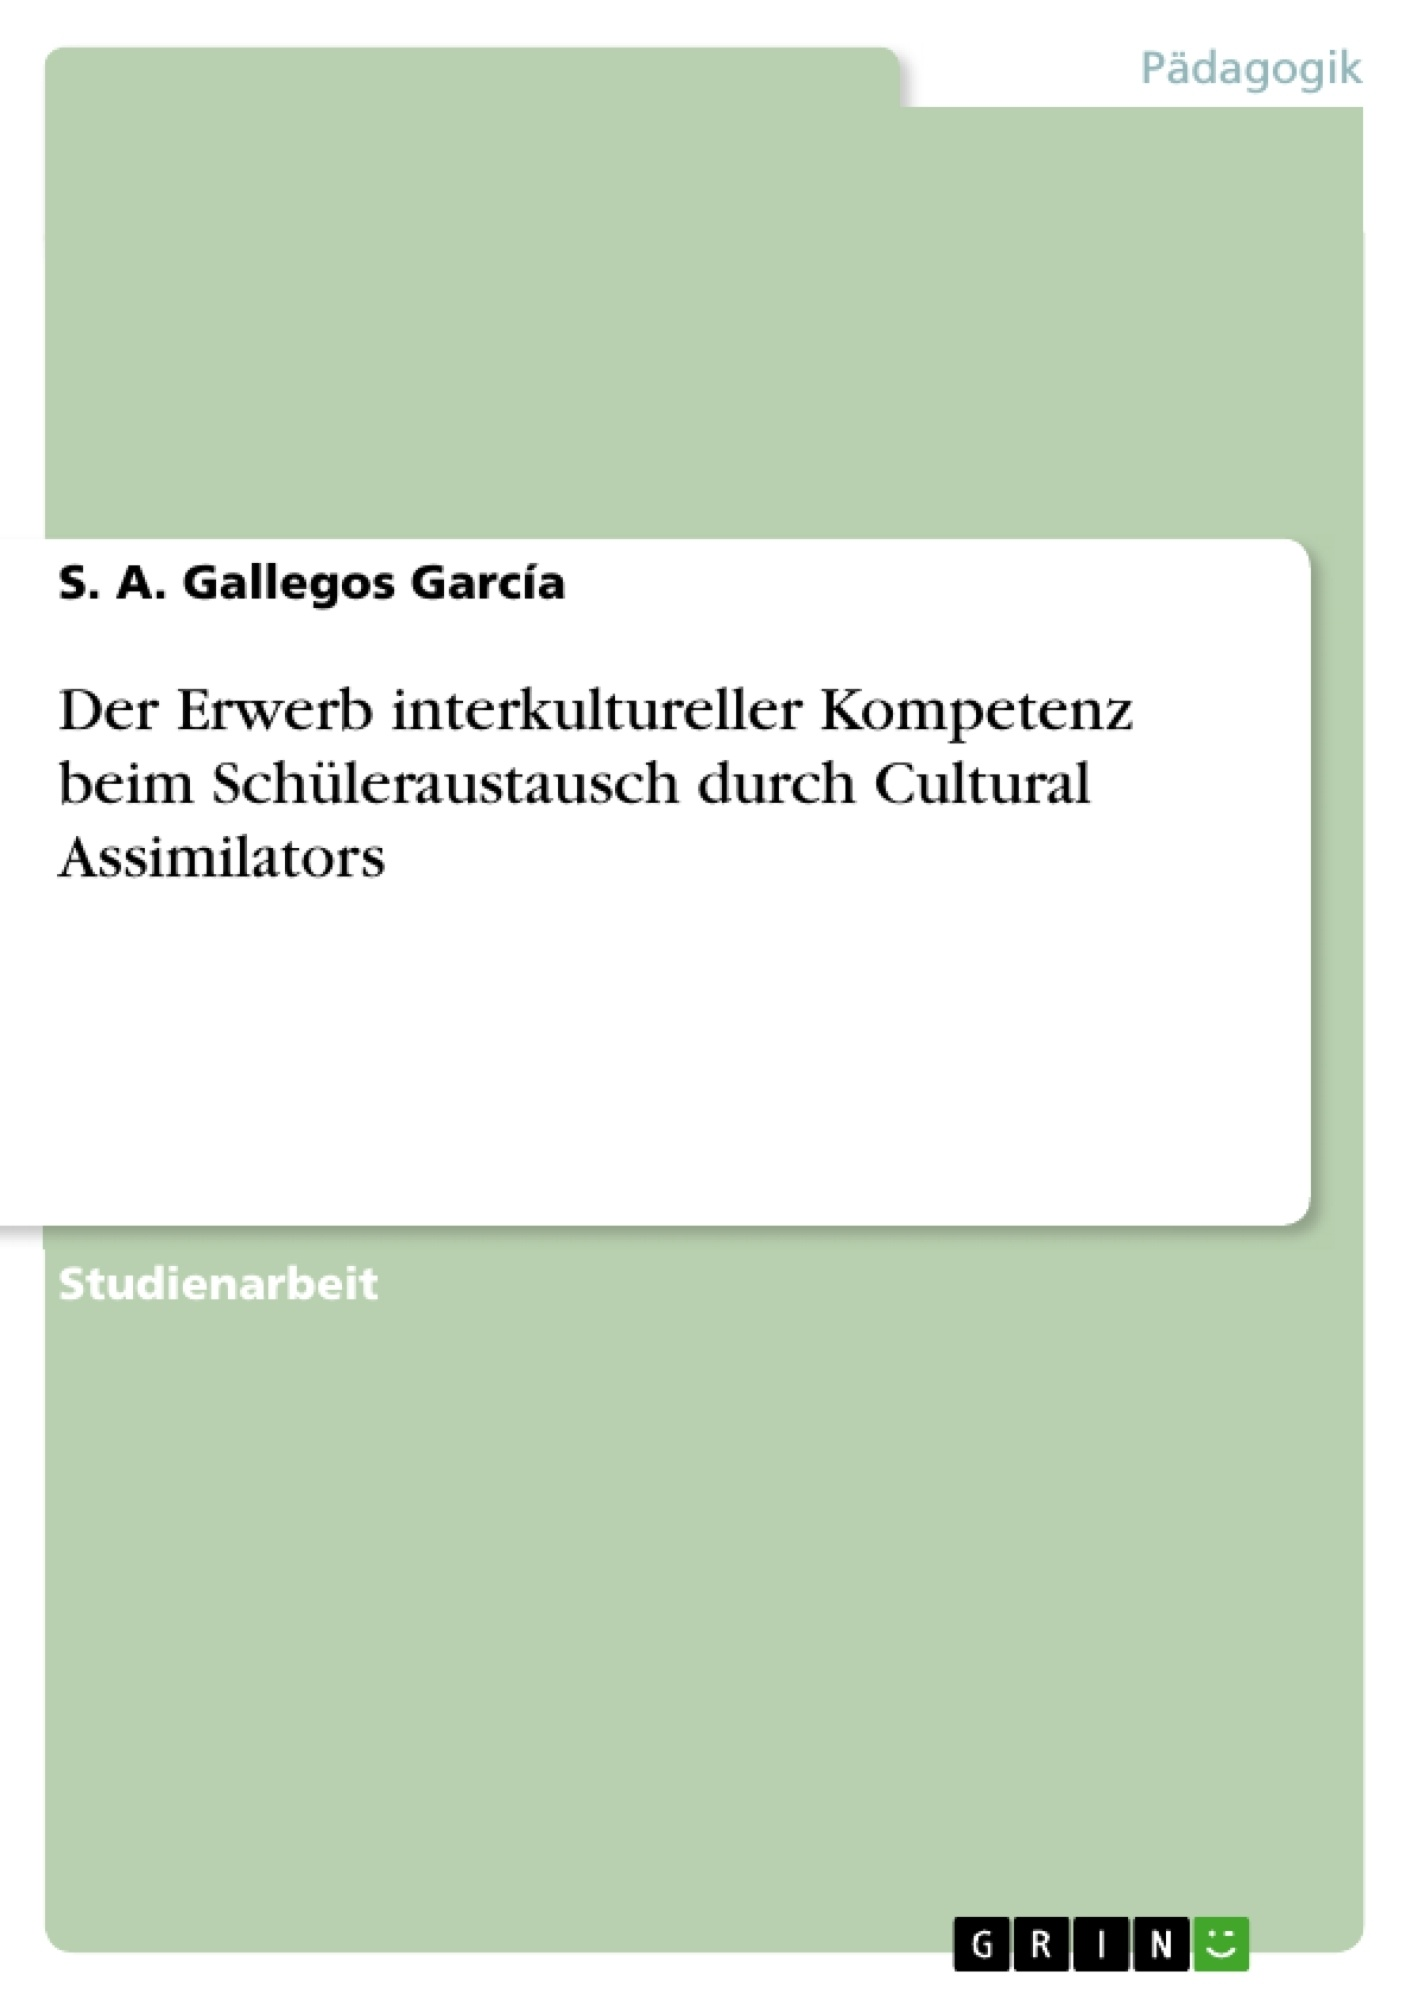 Titel: Der Erwerb interkultureller Kompetenz beim Schüleraustausch durch Cultural Assimilators